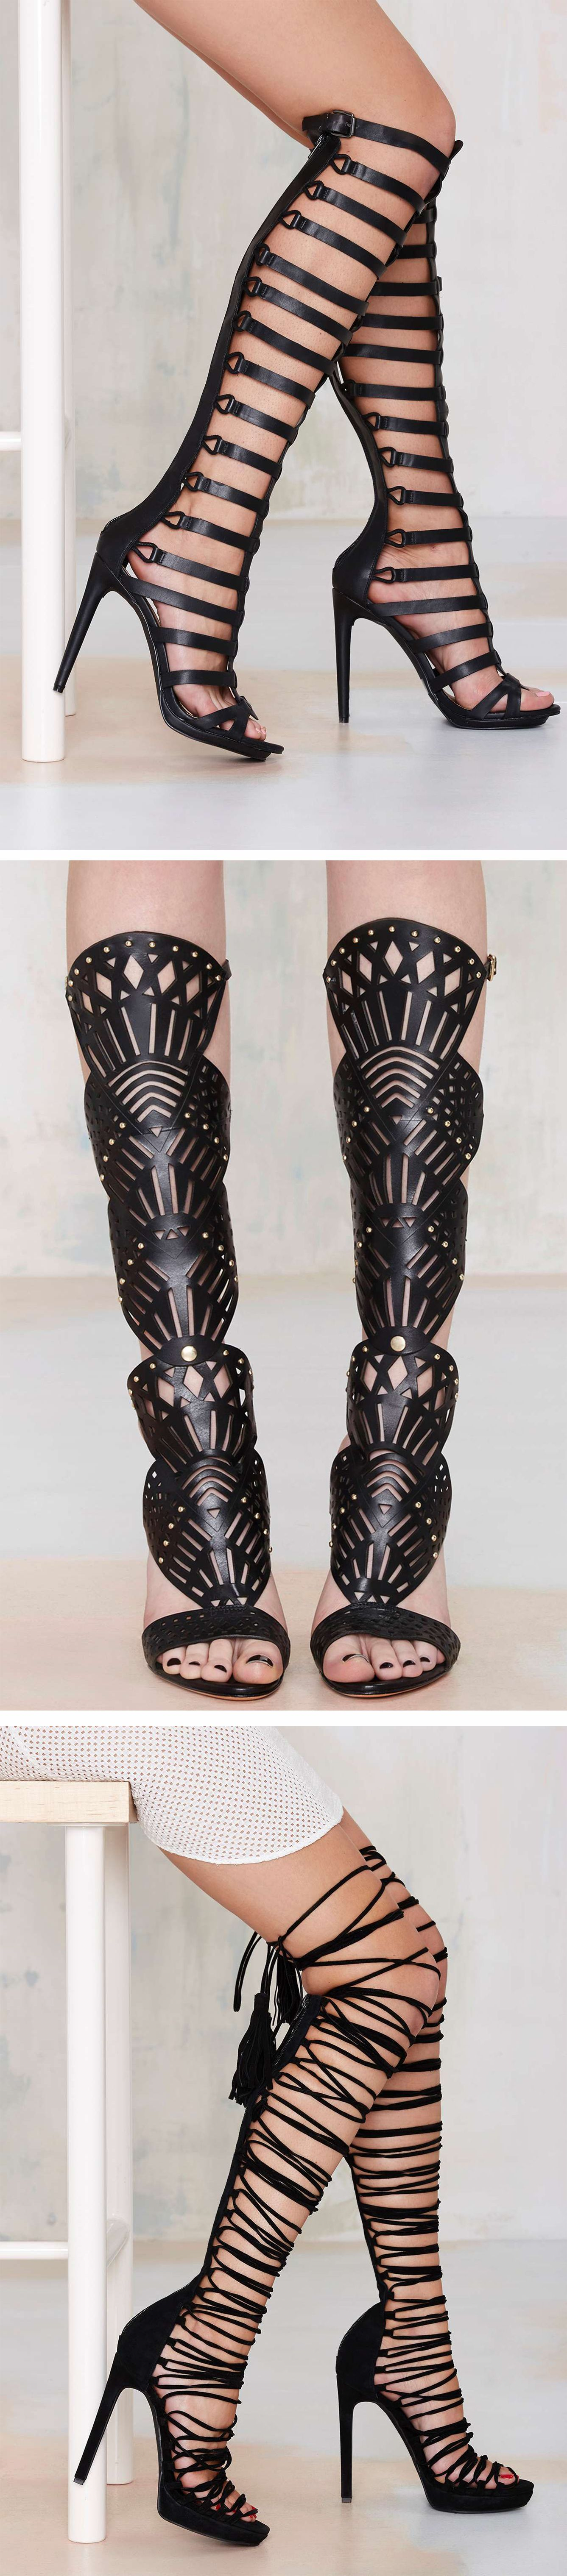 Women's Sandals | Flat & Gladiator Sandals